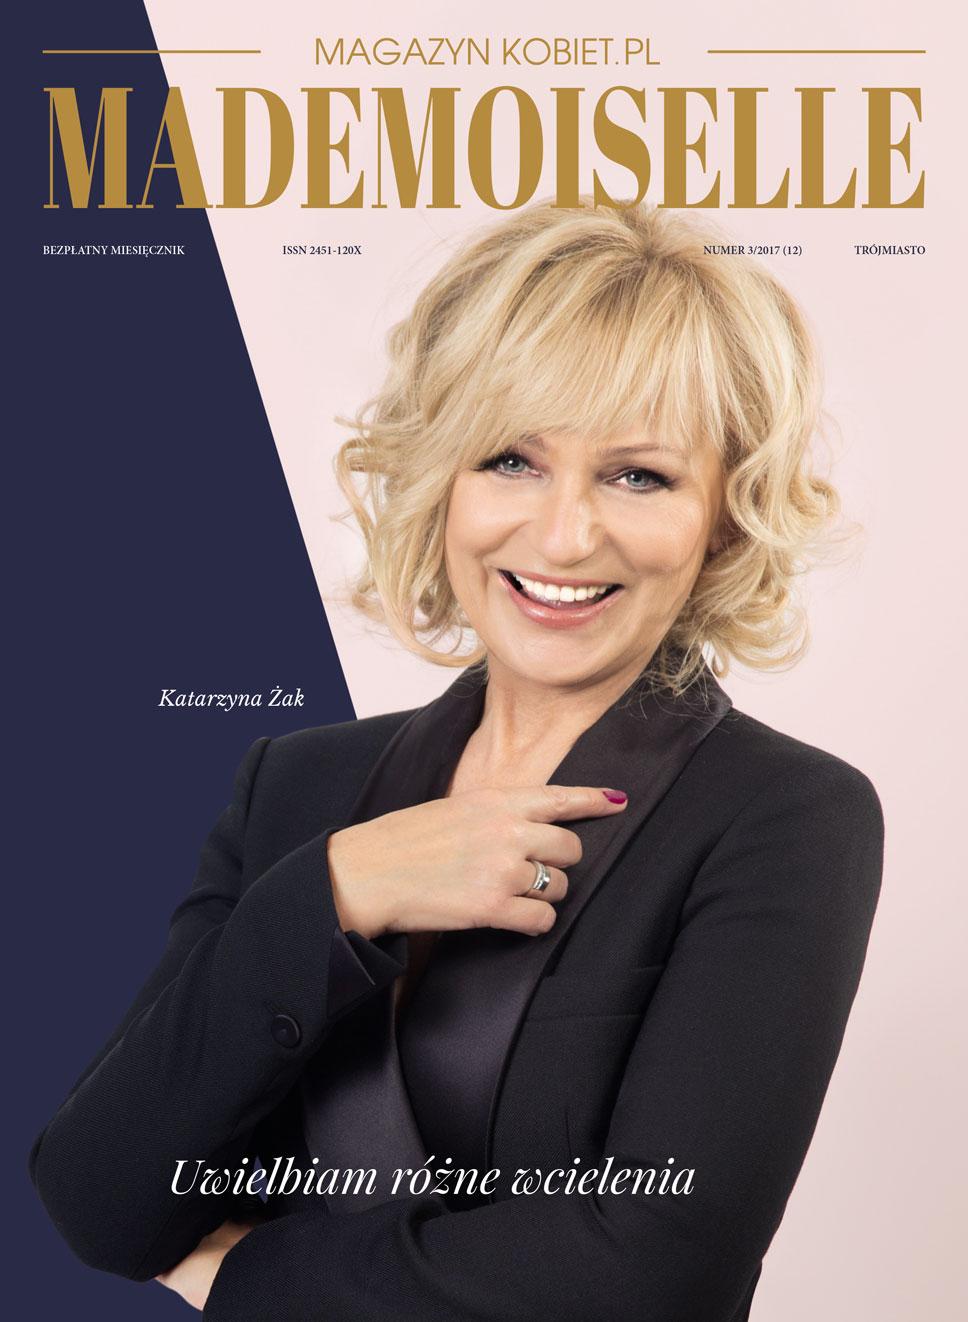 magazynkobiet.pl - mademoiselle marzec - MAGAZYN KOBIET - Mademoiselle 3/2017